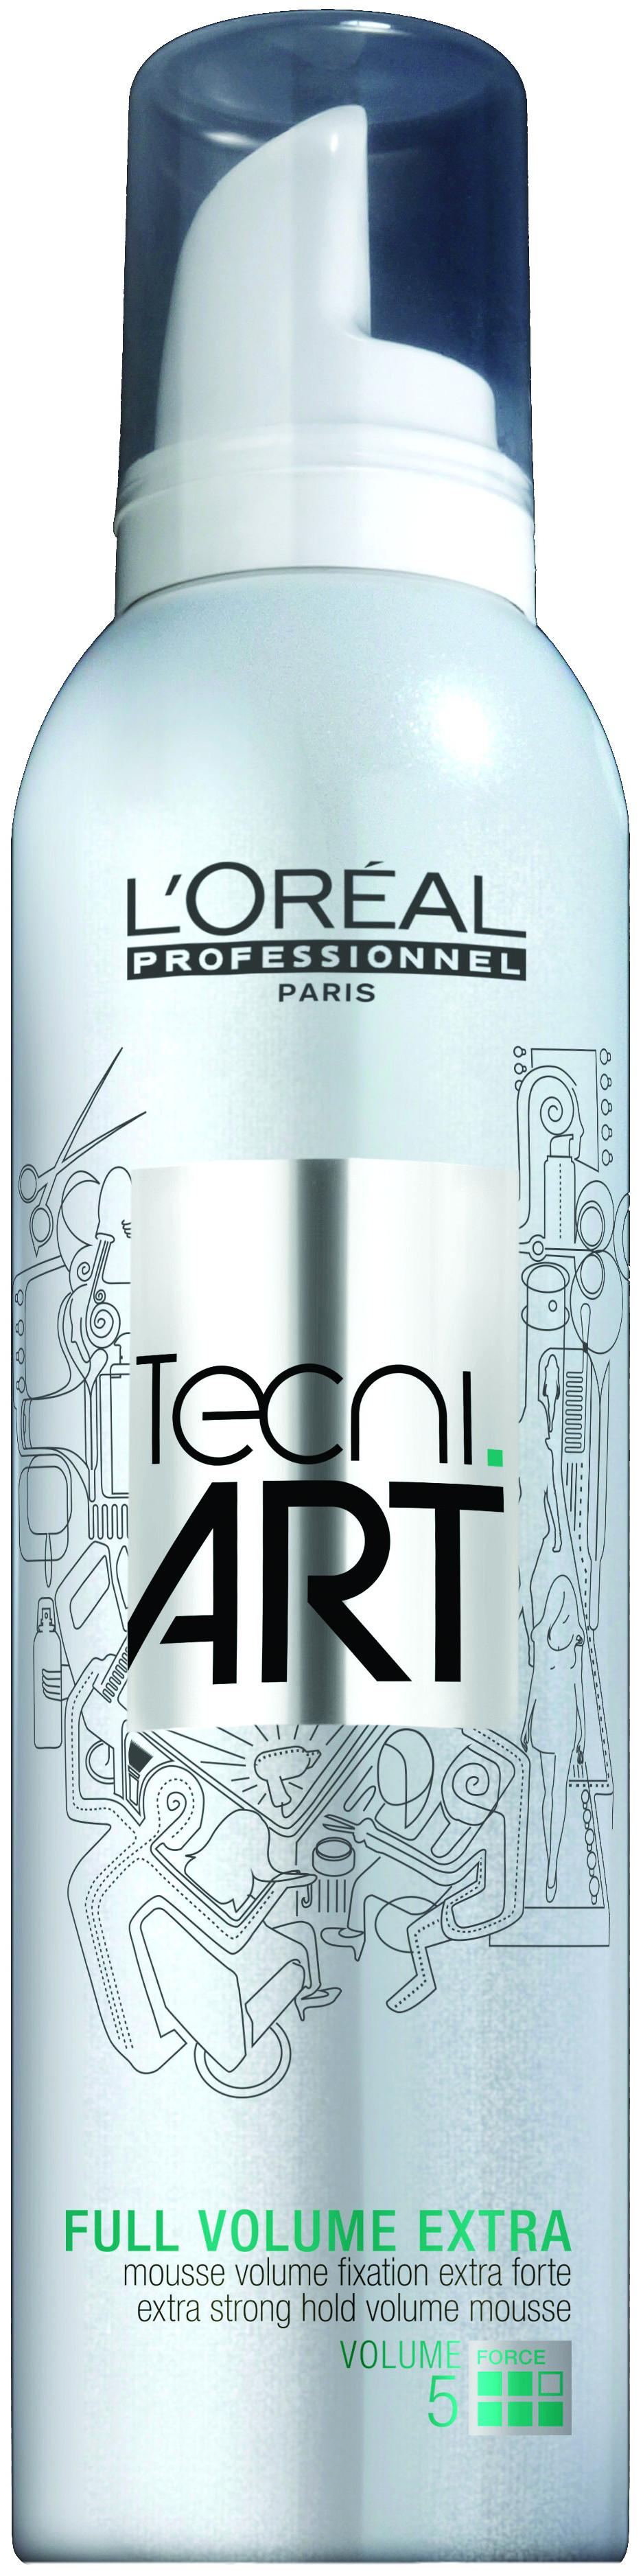 Купить Мусс для волос L'Oréal Professionnel Tecni.ART Full Volume Extra 250 мл, L'Oreal Professionnel